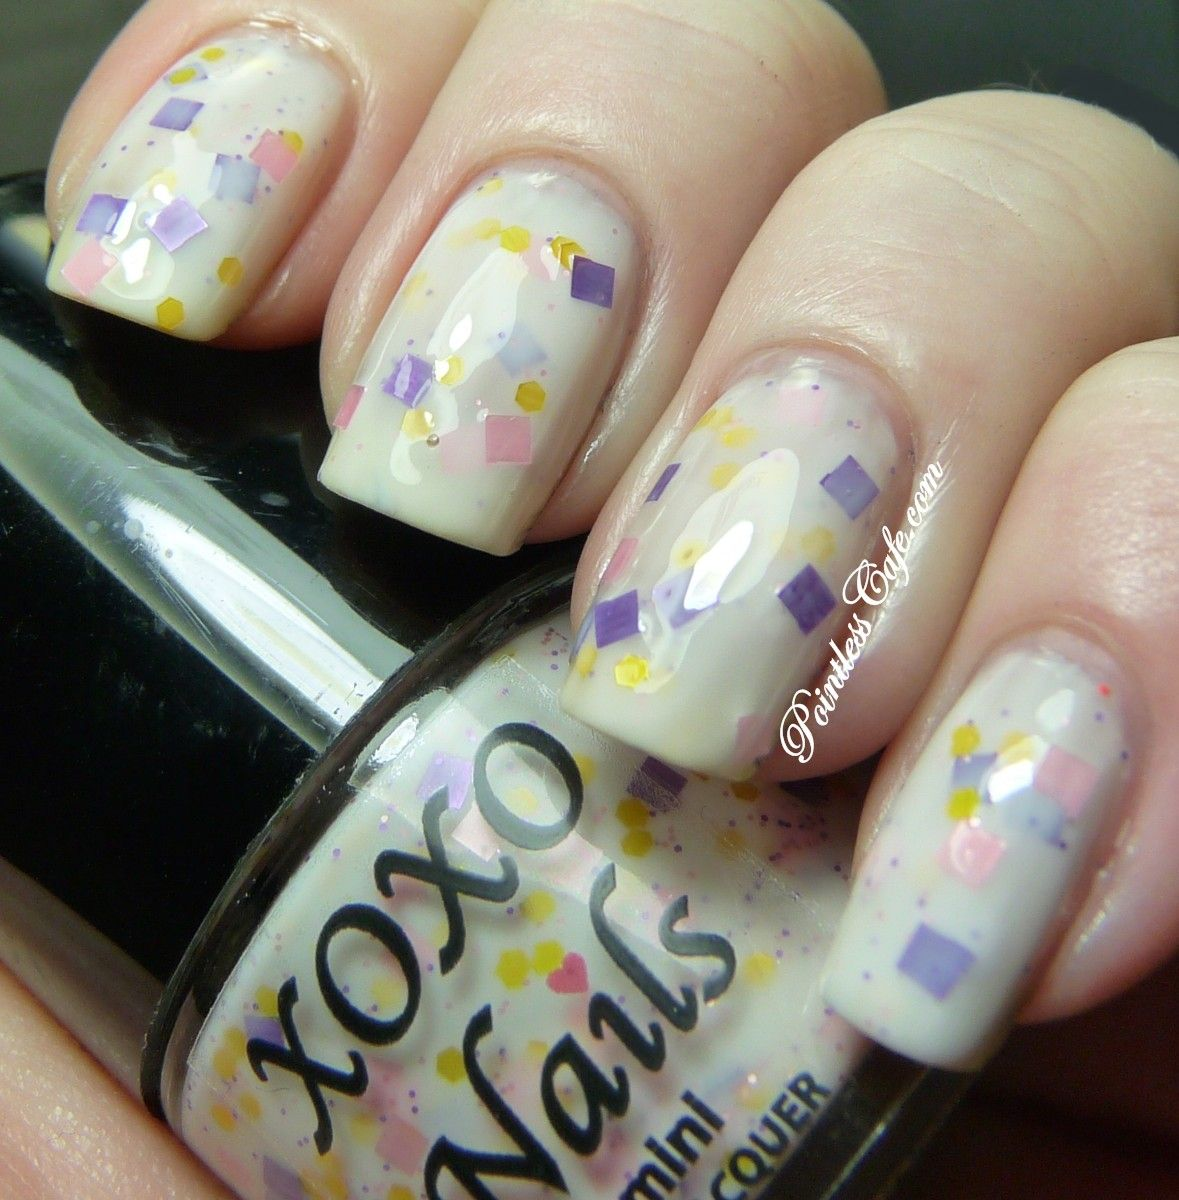 Xoxo Nails Dont Play Me Pointless Cafe Indie Nail Polish